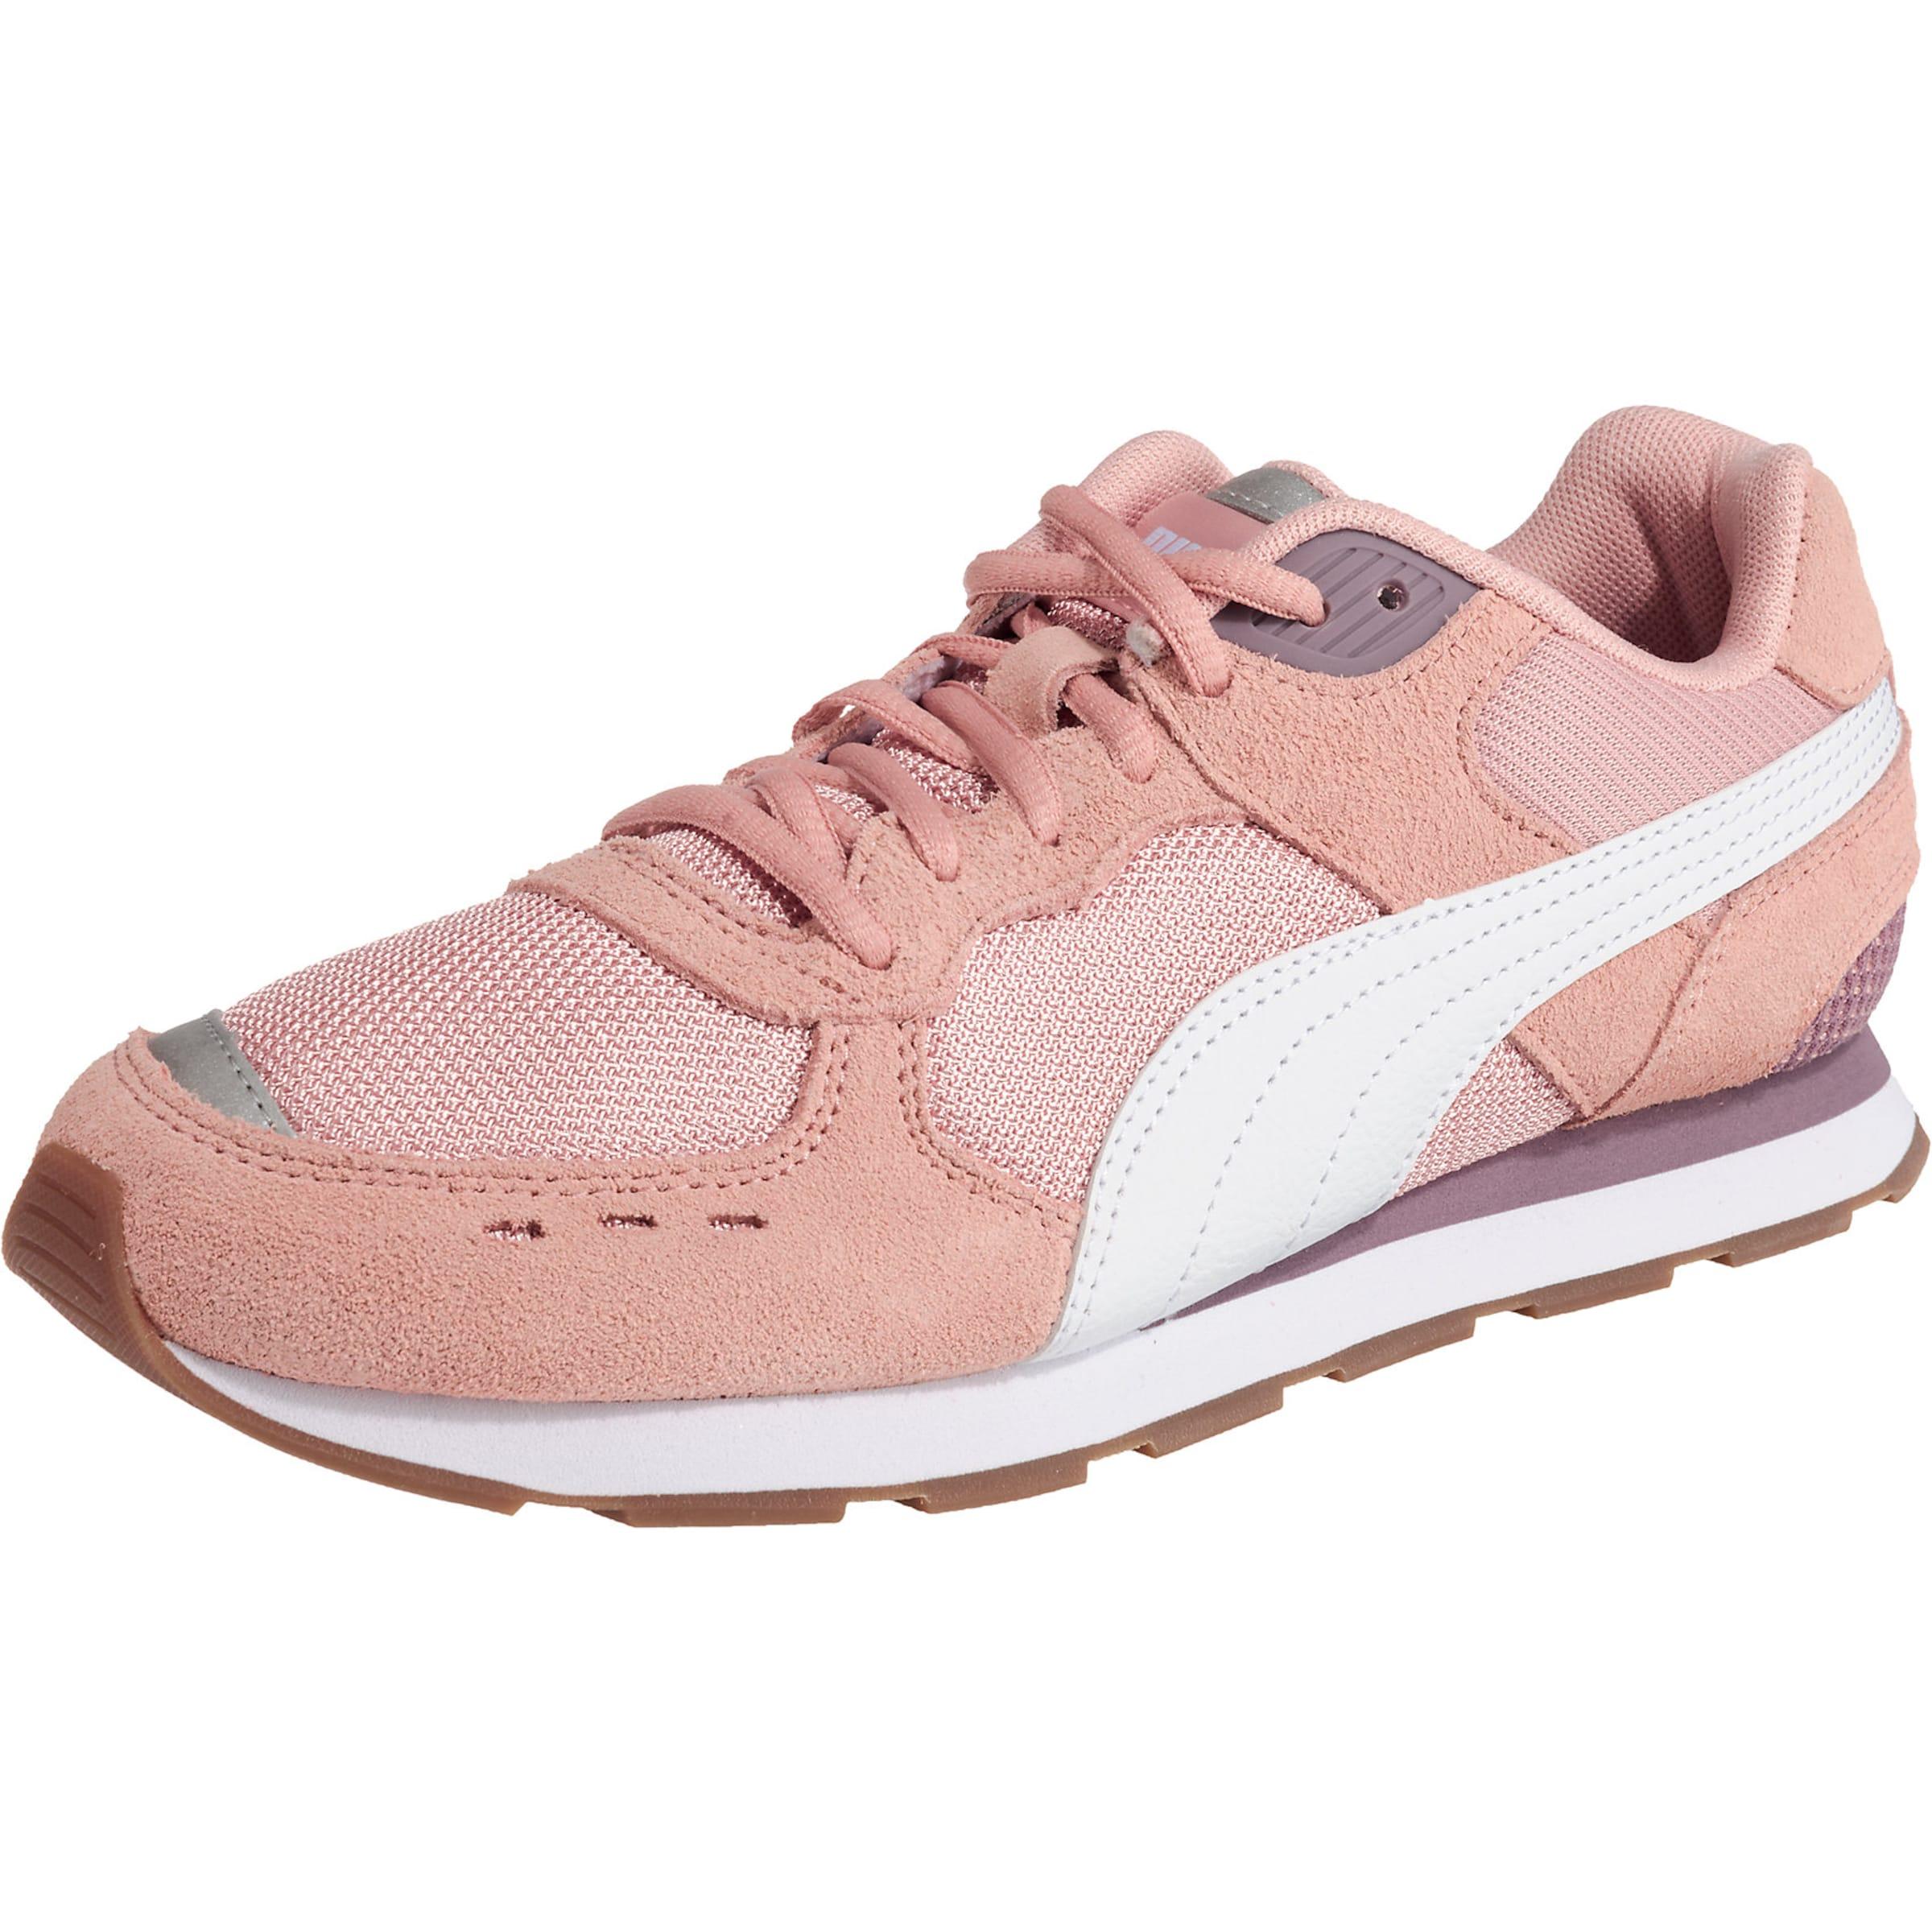 Puma 'vista' Weiß Sneakers HelllilaLachs In orBdCxWe